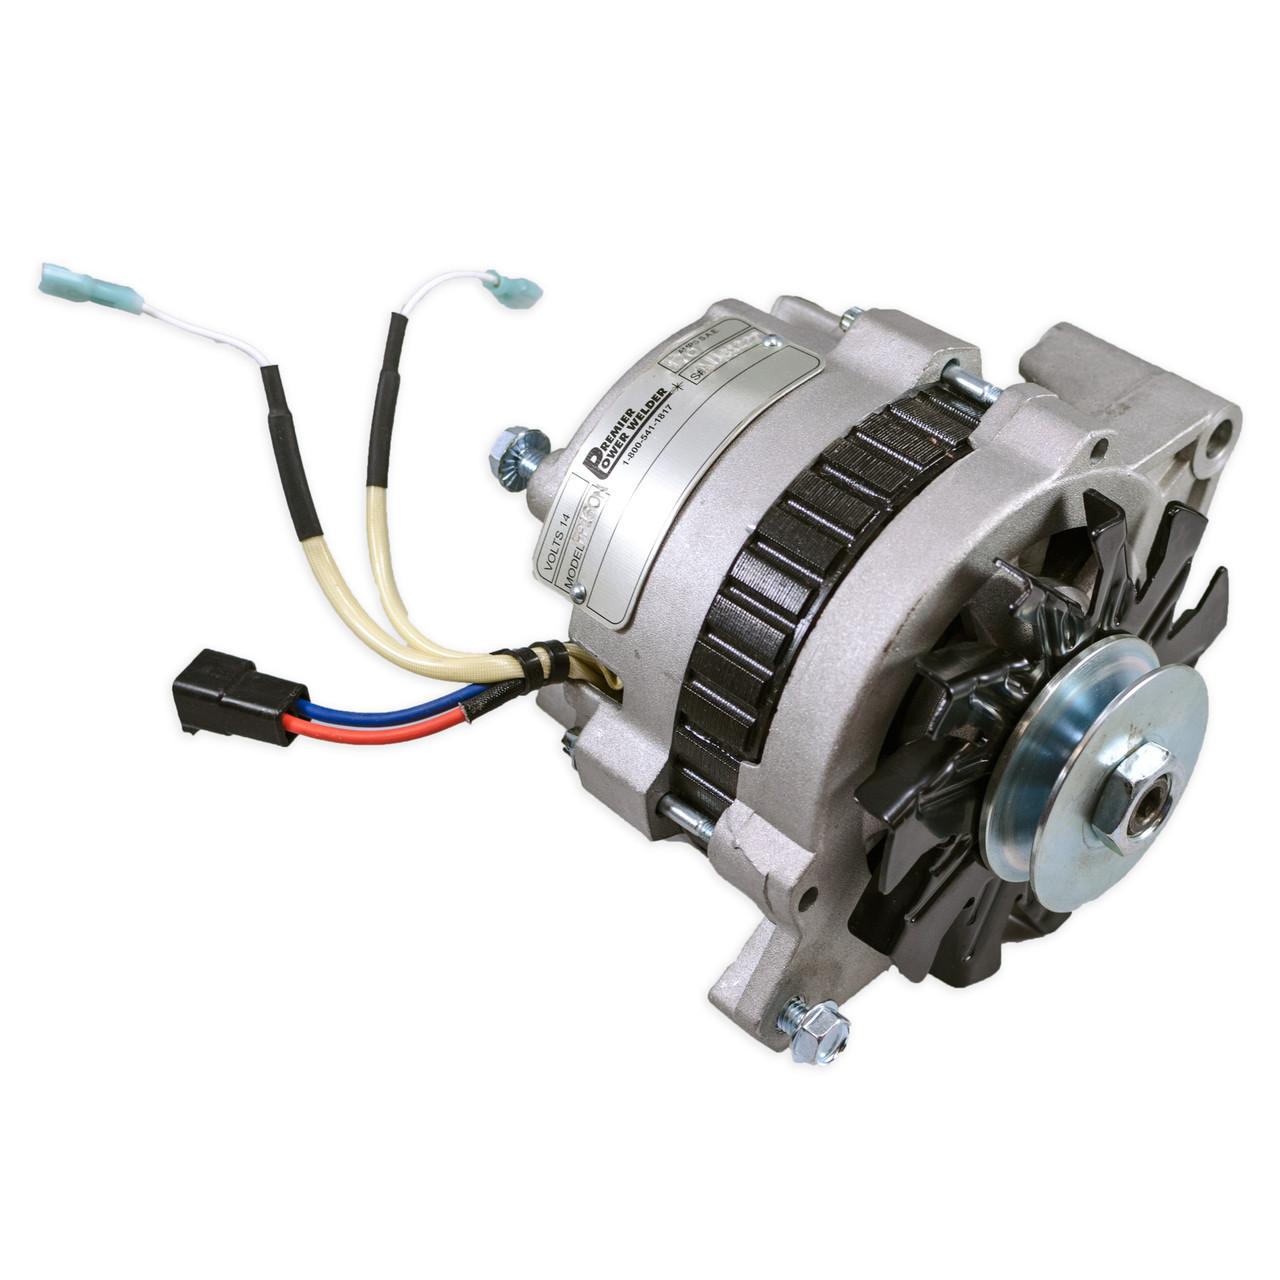 [SCHEMATICS_4ER]  Jeep Wagoneer 1978-1987, 170 amps, Single V Pulley - High Output & Welding  Alternator - Premier Power Welder, LLC | 1983 Jeep Alternator Wiring |  | Premier Power Welder